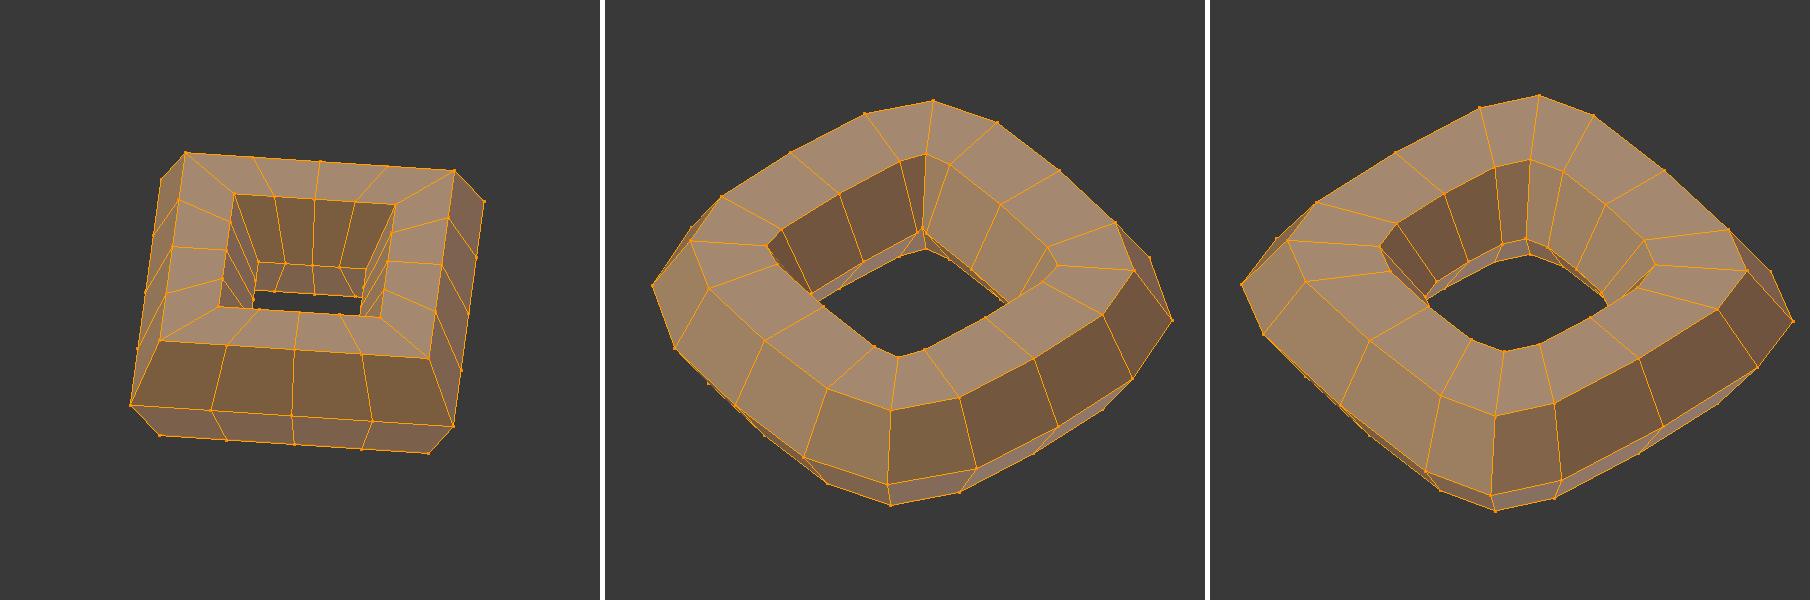 bridge-edge-loops-interpolation